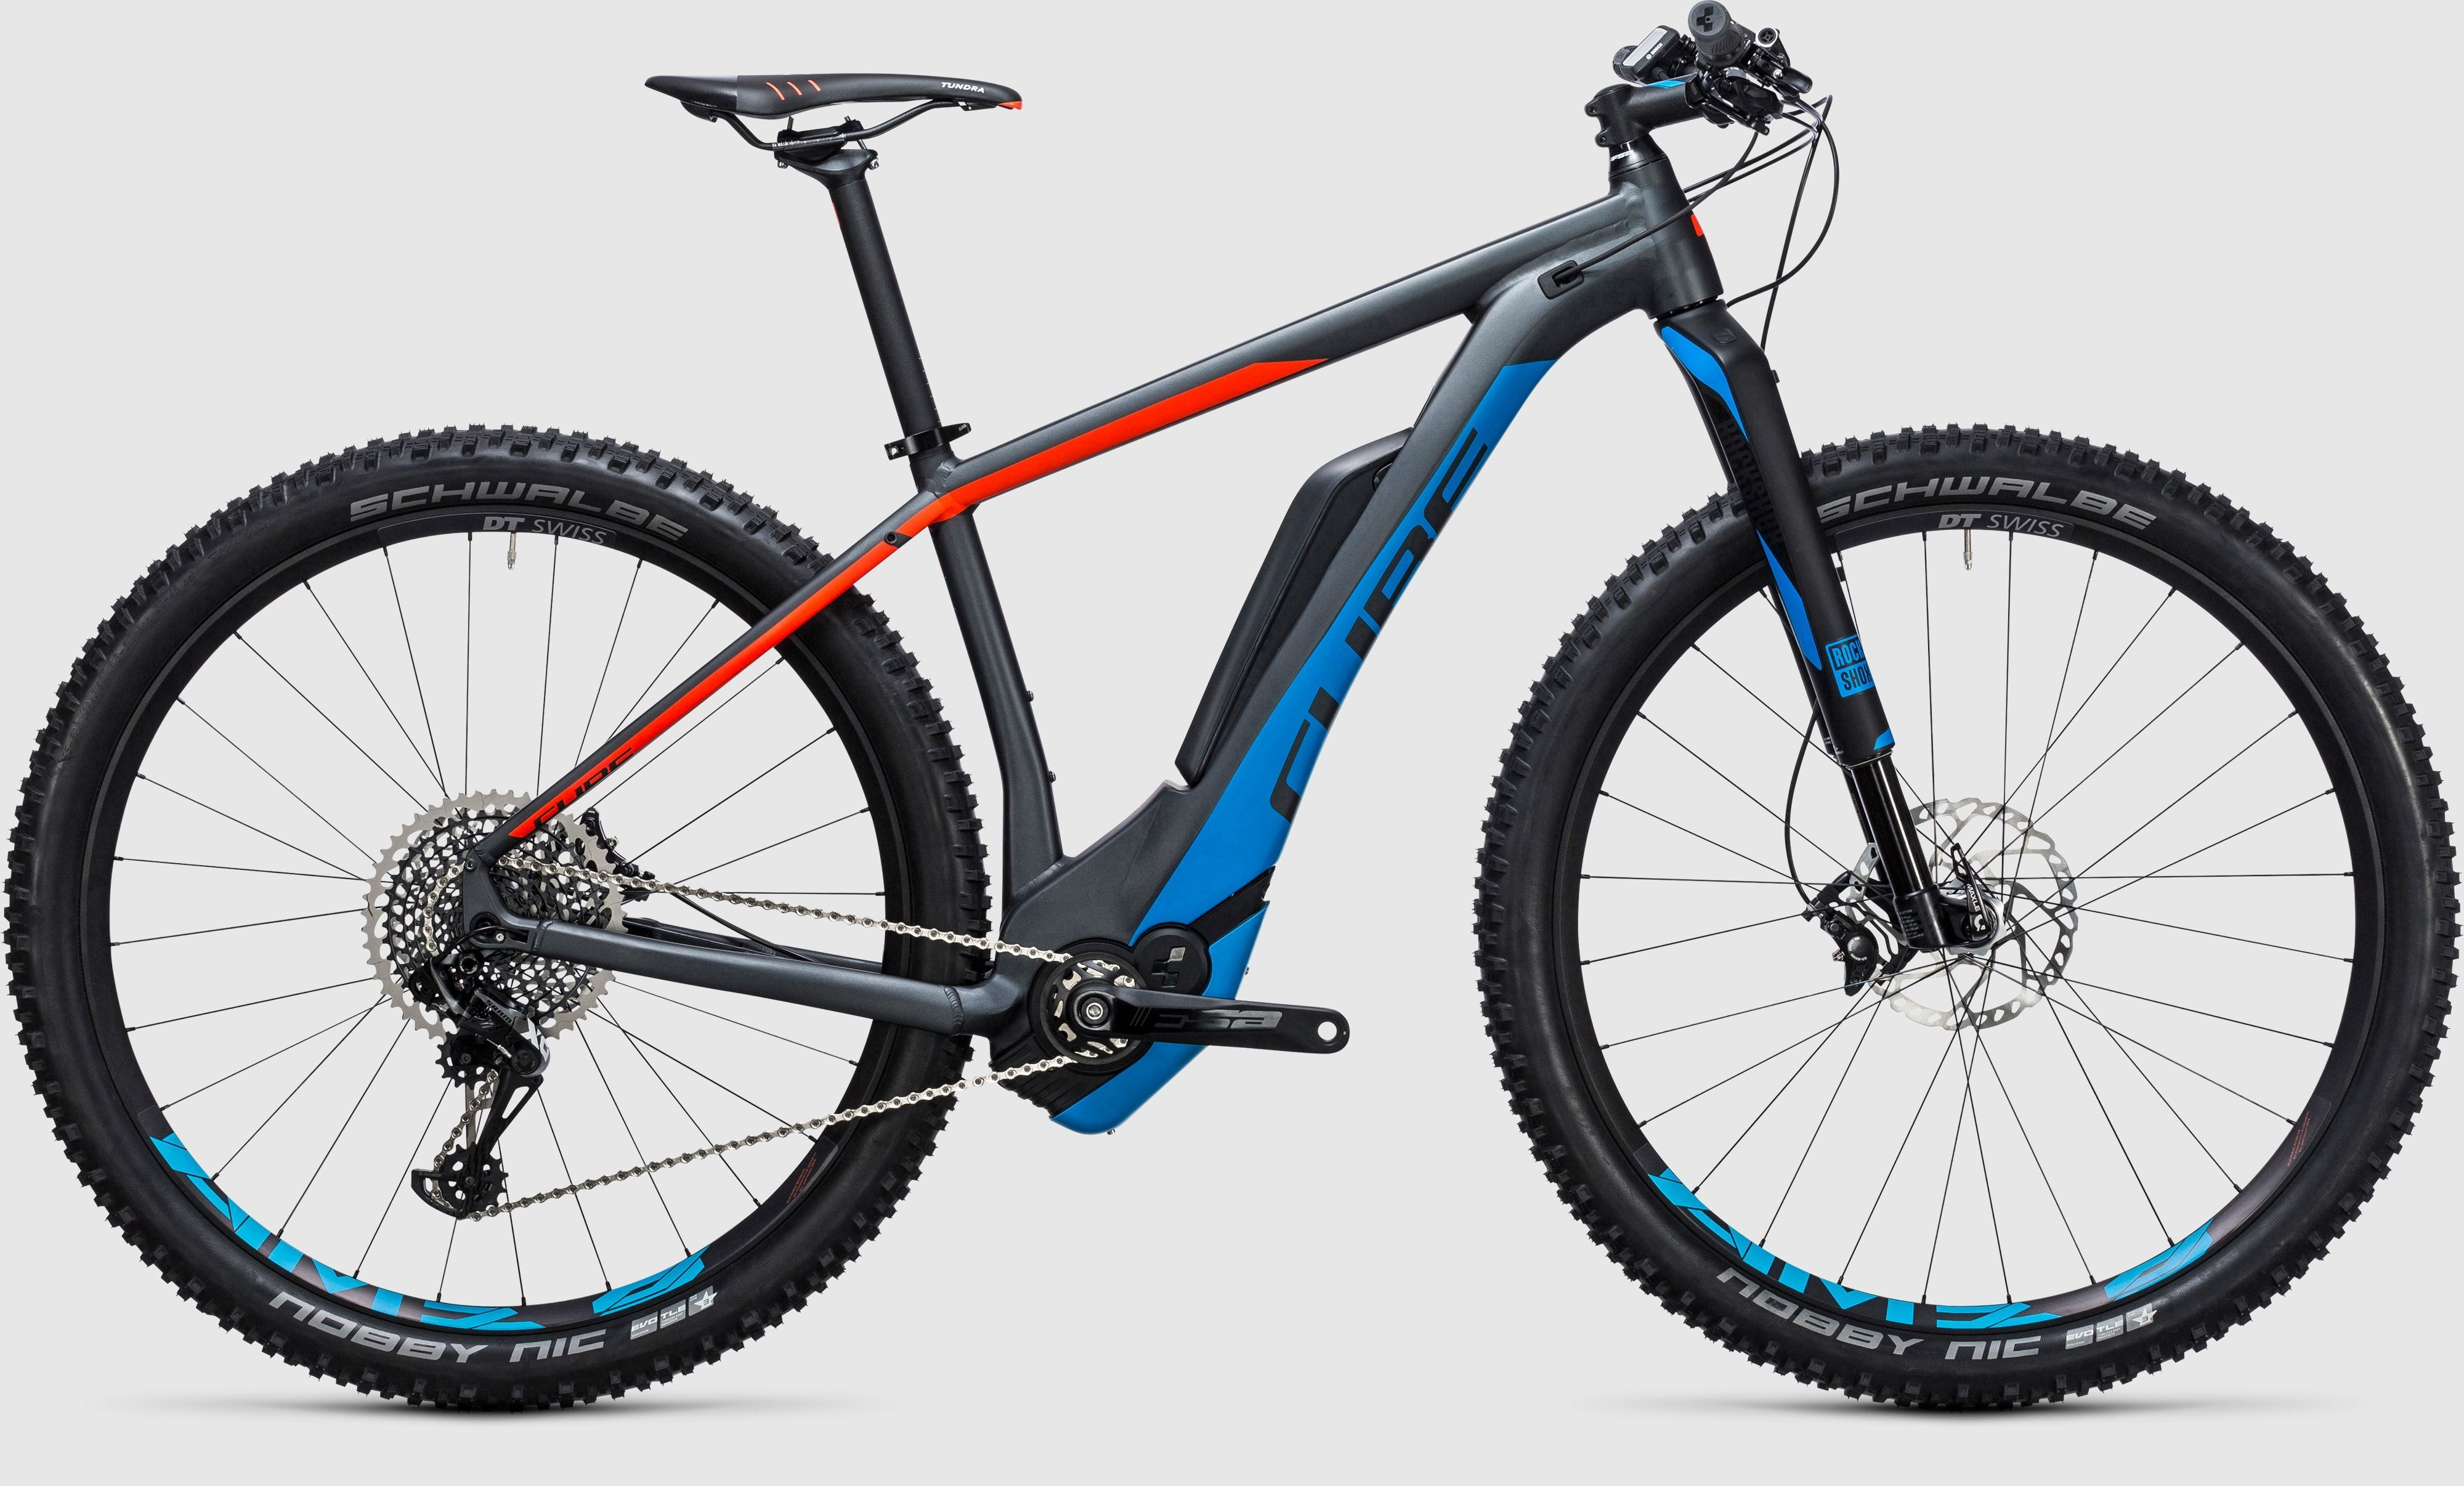 fahrrad e bike kaufen hot bike cube 17 reaction hybrid hpa eagle 500 onlineshop. Black Bedroom Furniture Sets. Home Design Ideas